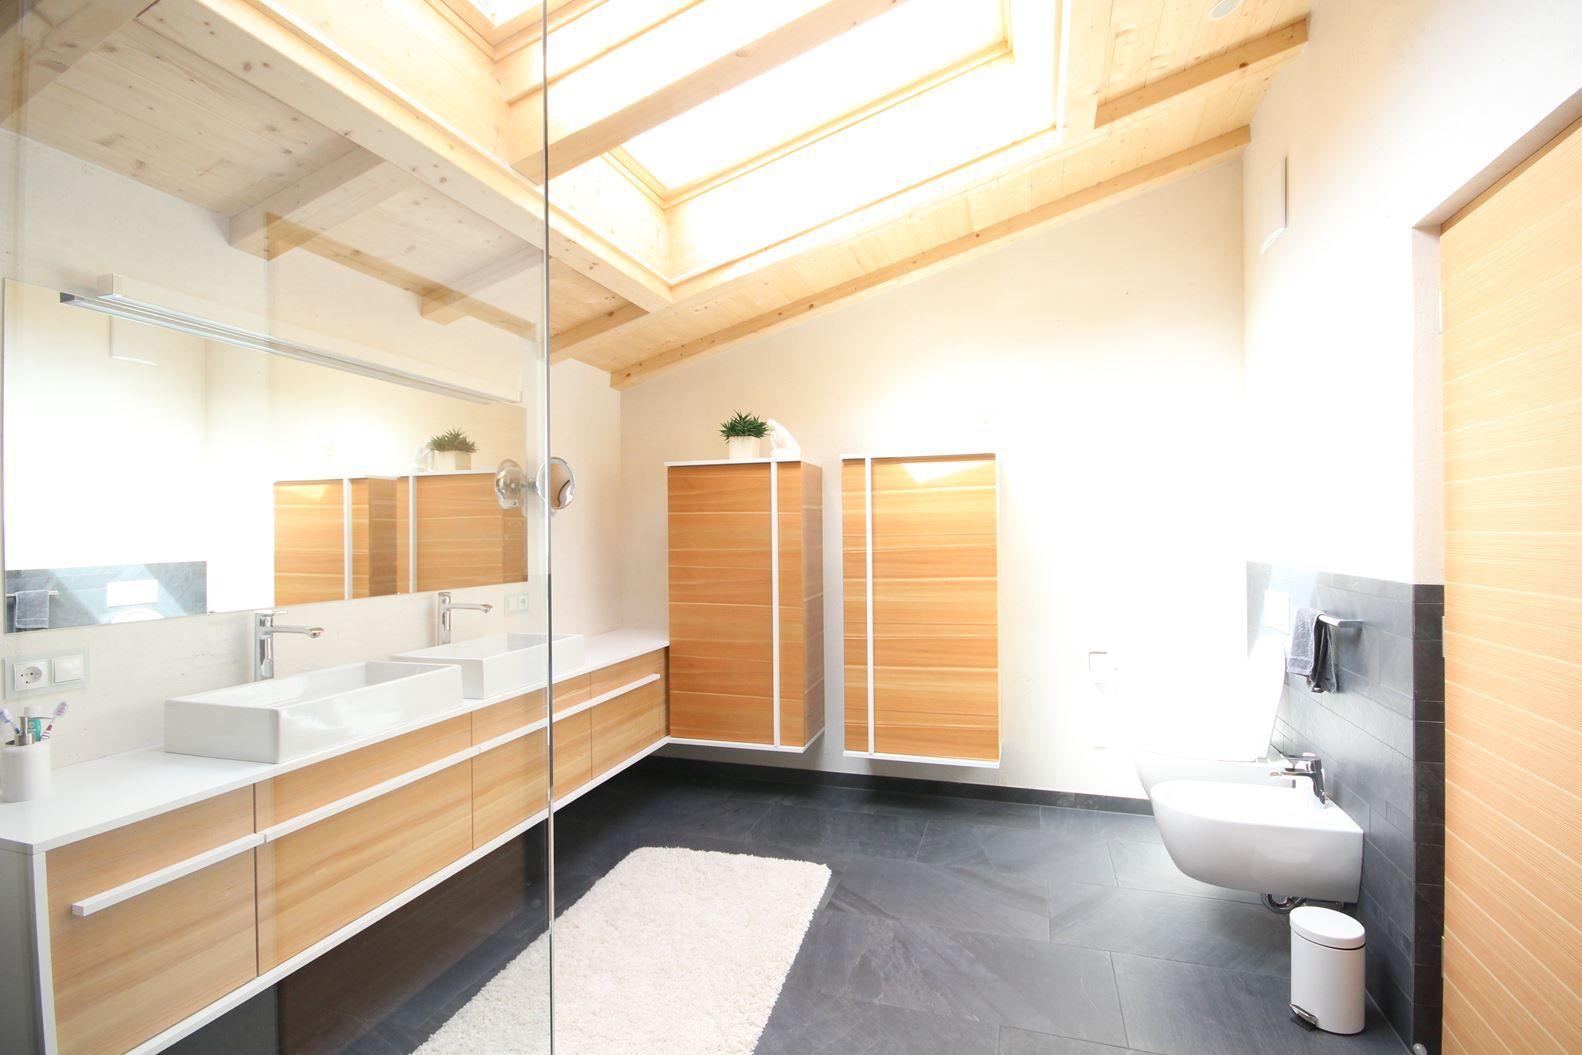 Bagno Montagna ~ Una mansarda in montagna bagno bathroom relax in mansarda